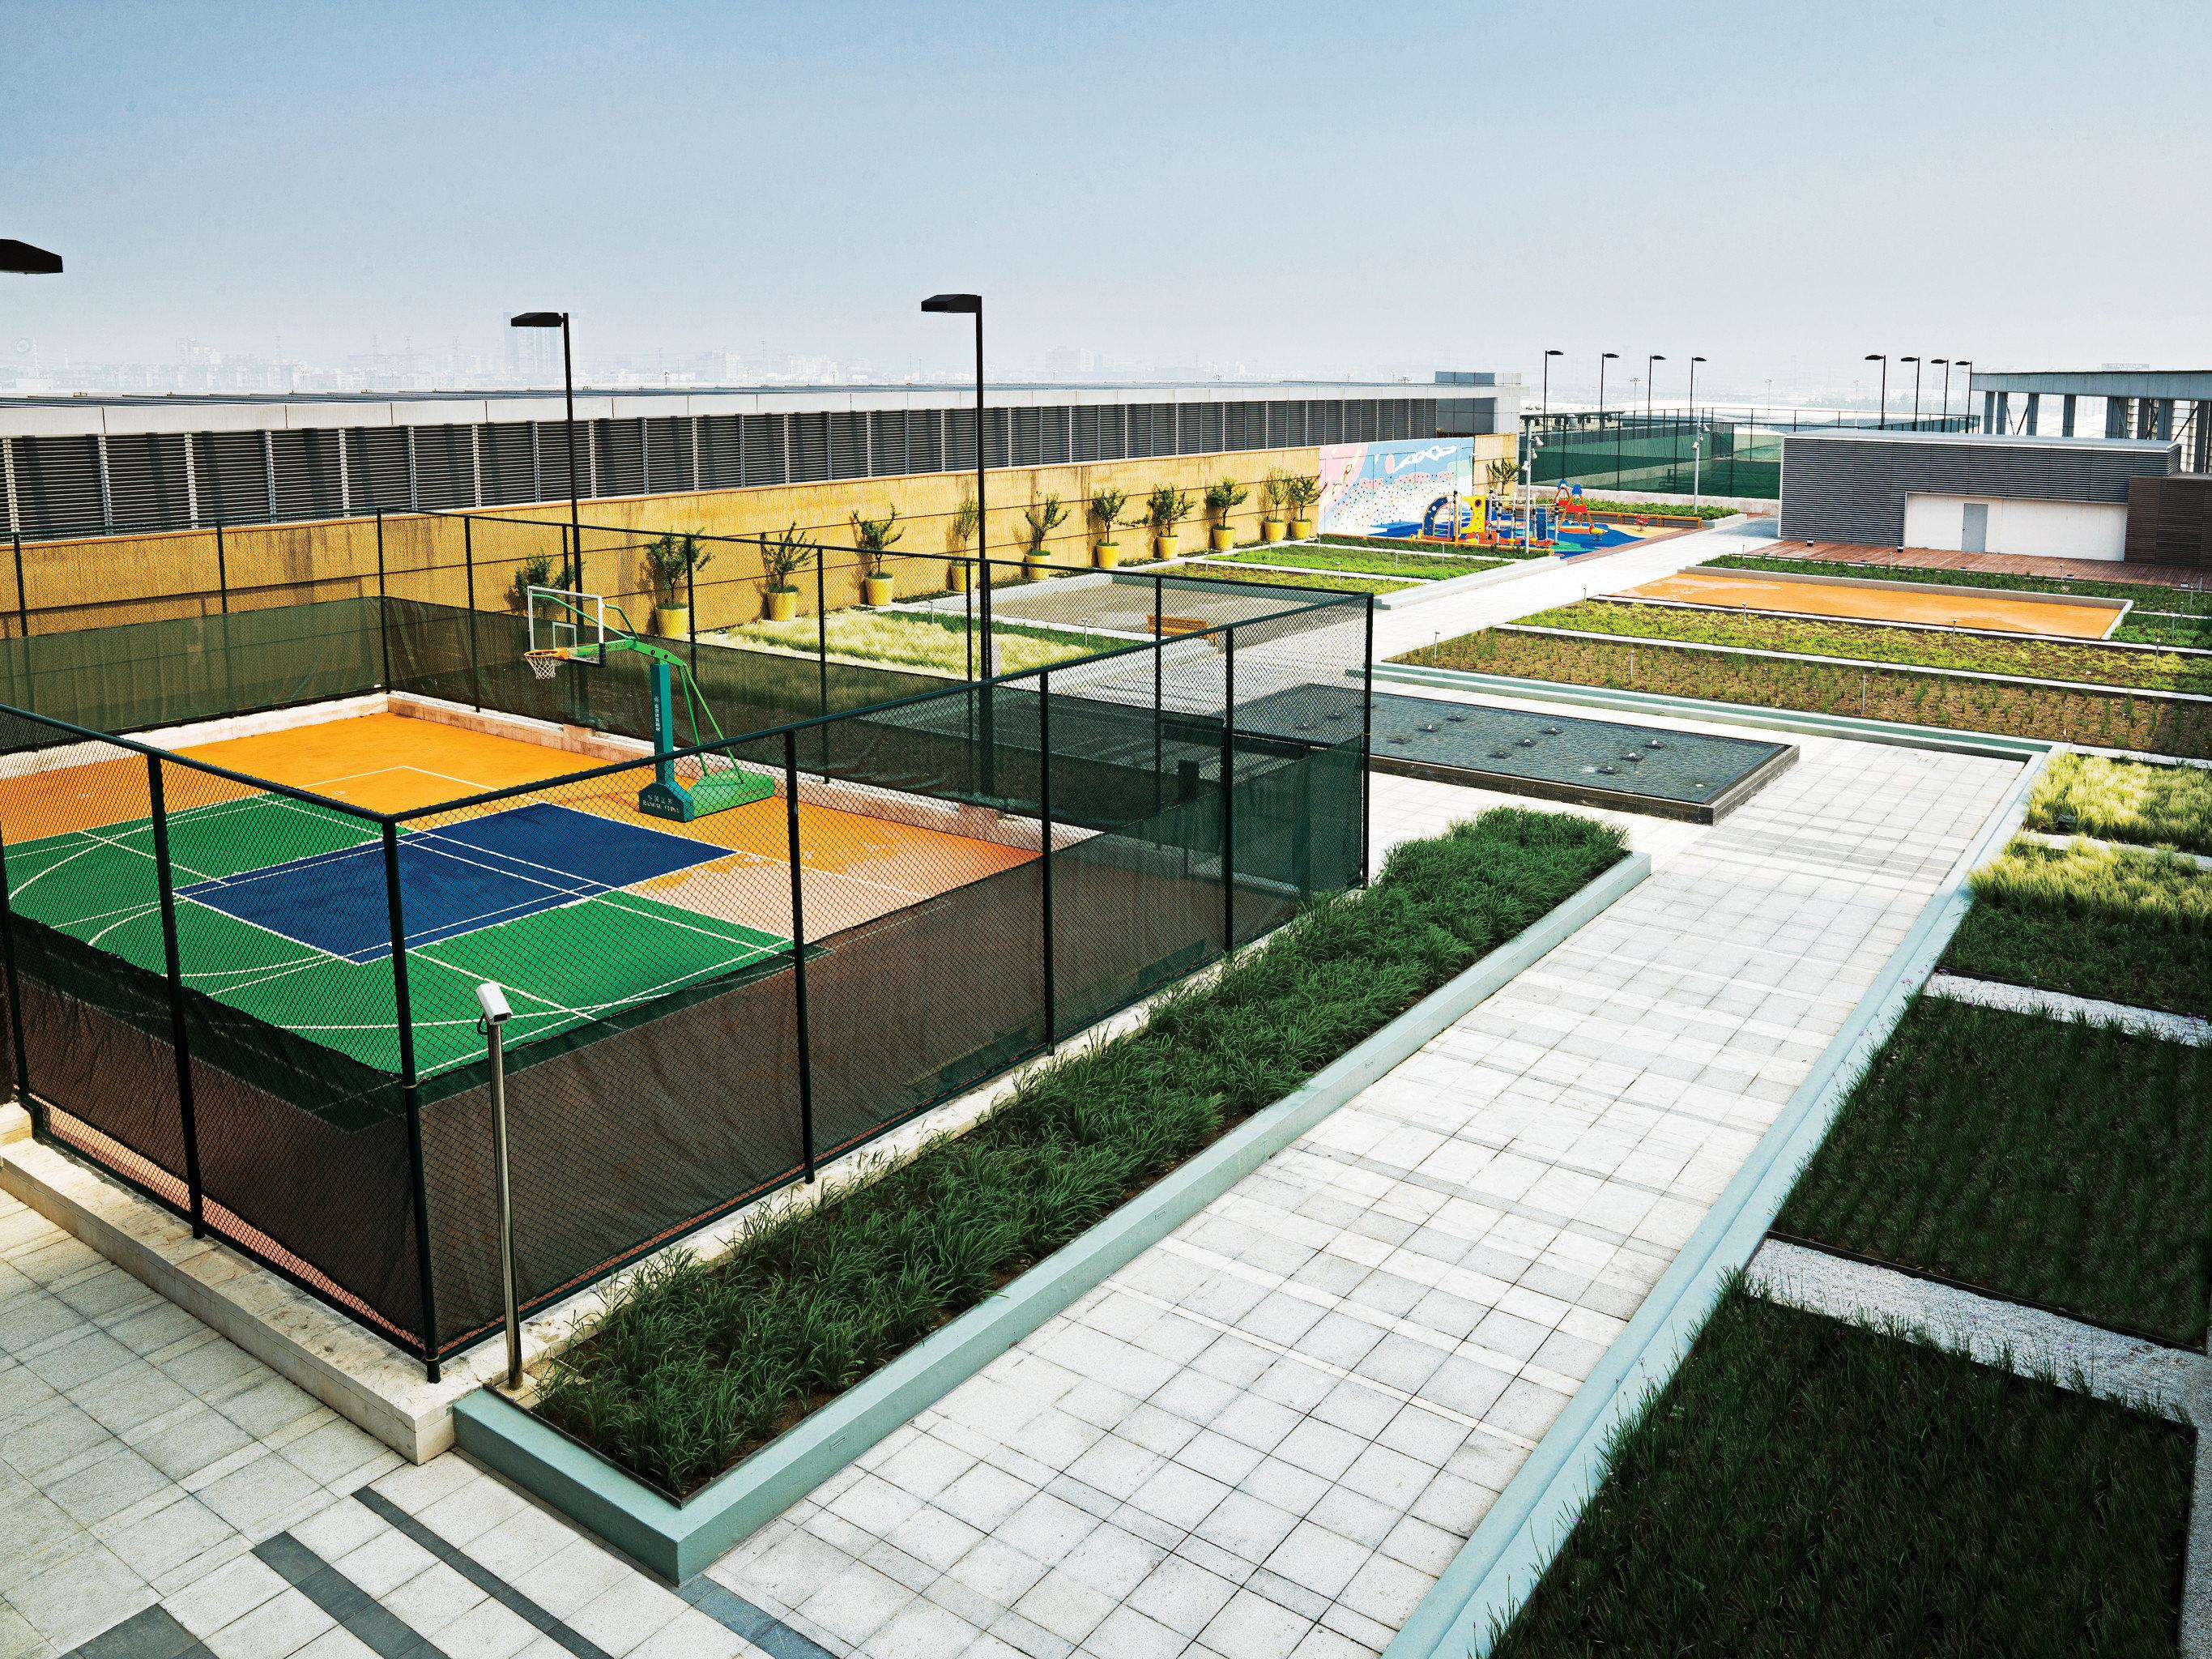 Fitness Grounds Sport Wellness sky green structure swimming pool sport venue leisure centre baseball field soccer specific stadium stadium arena